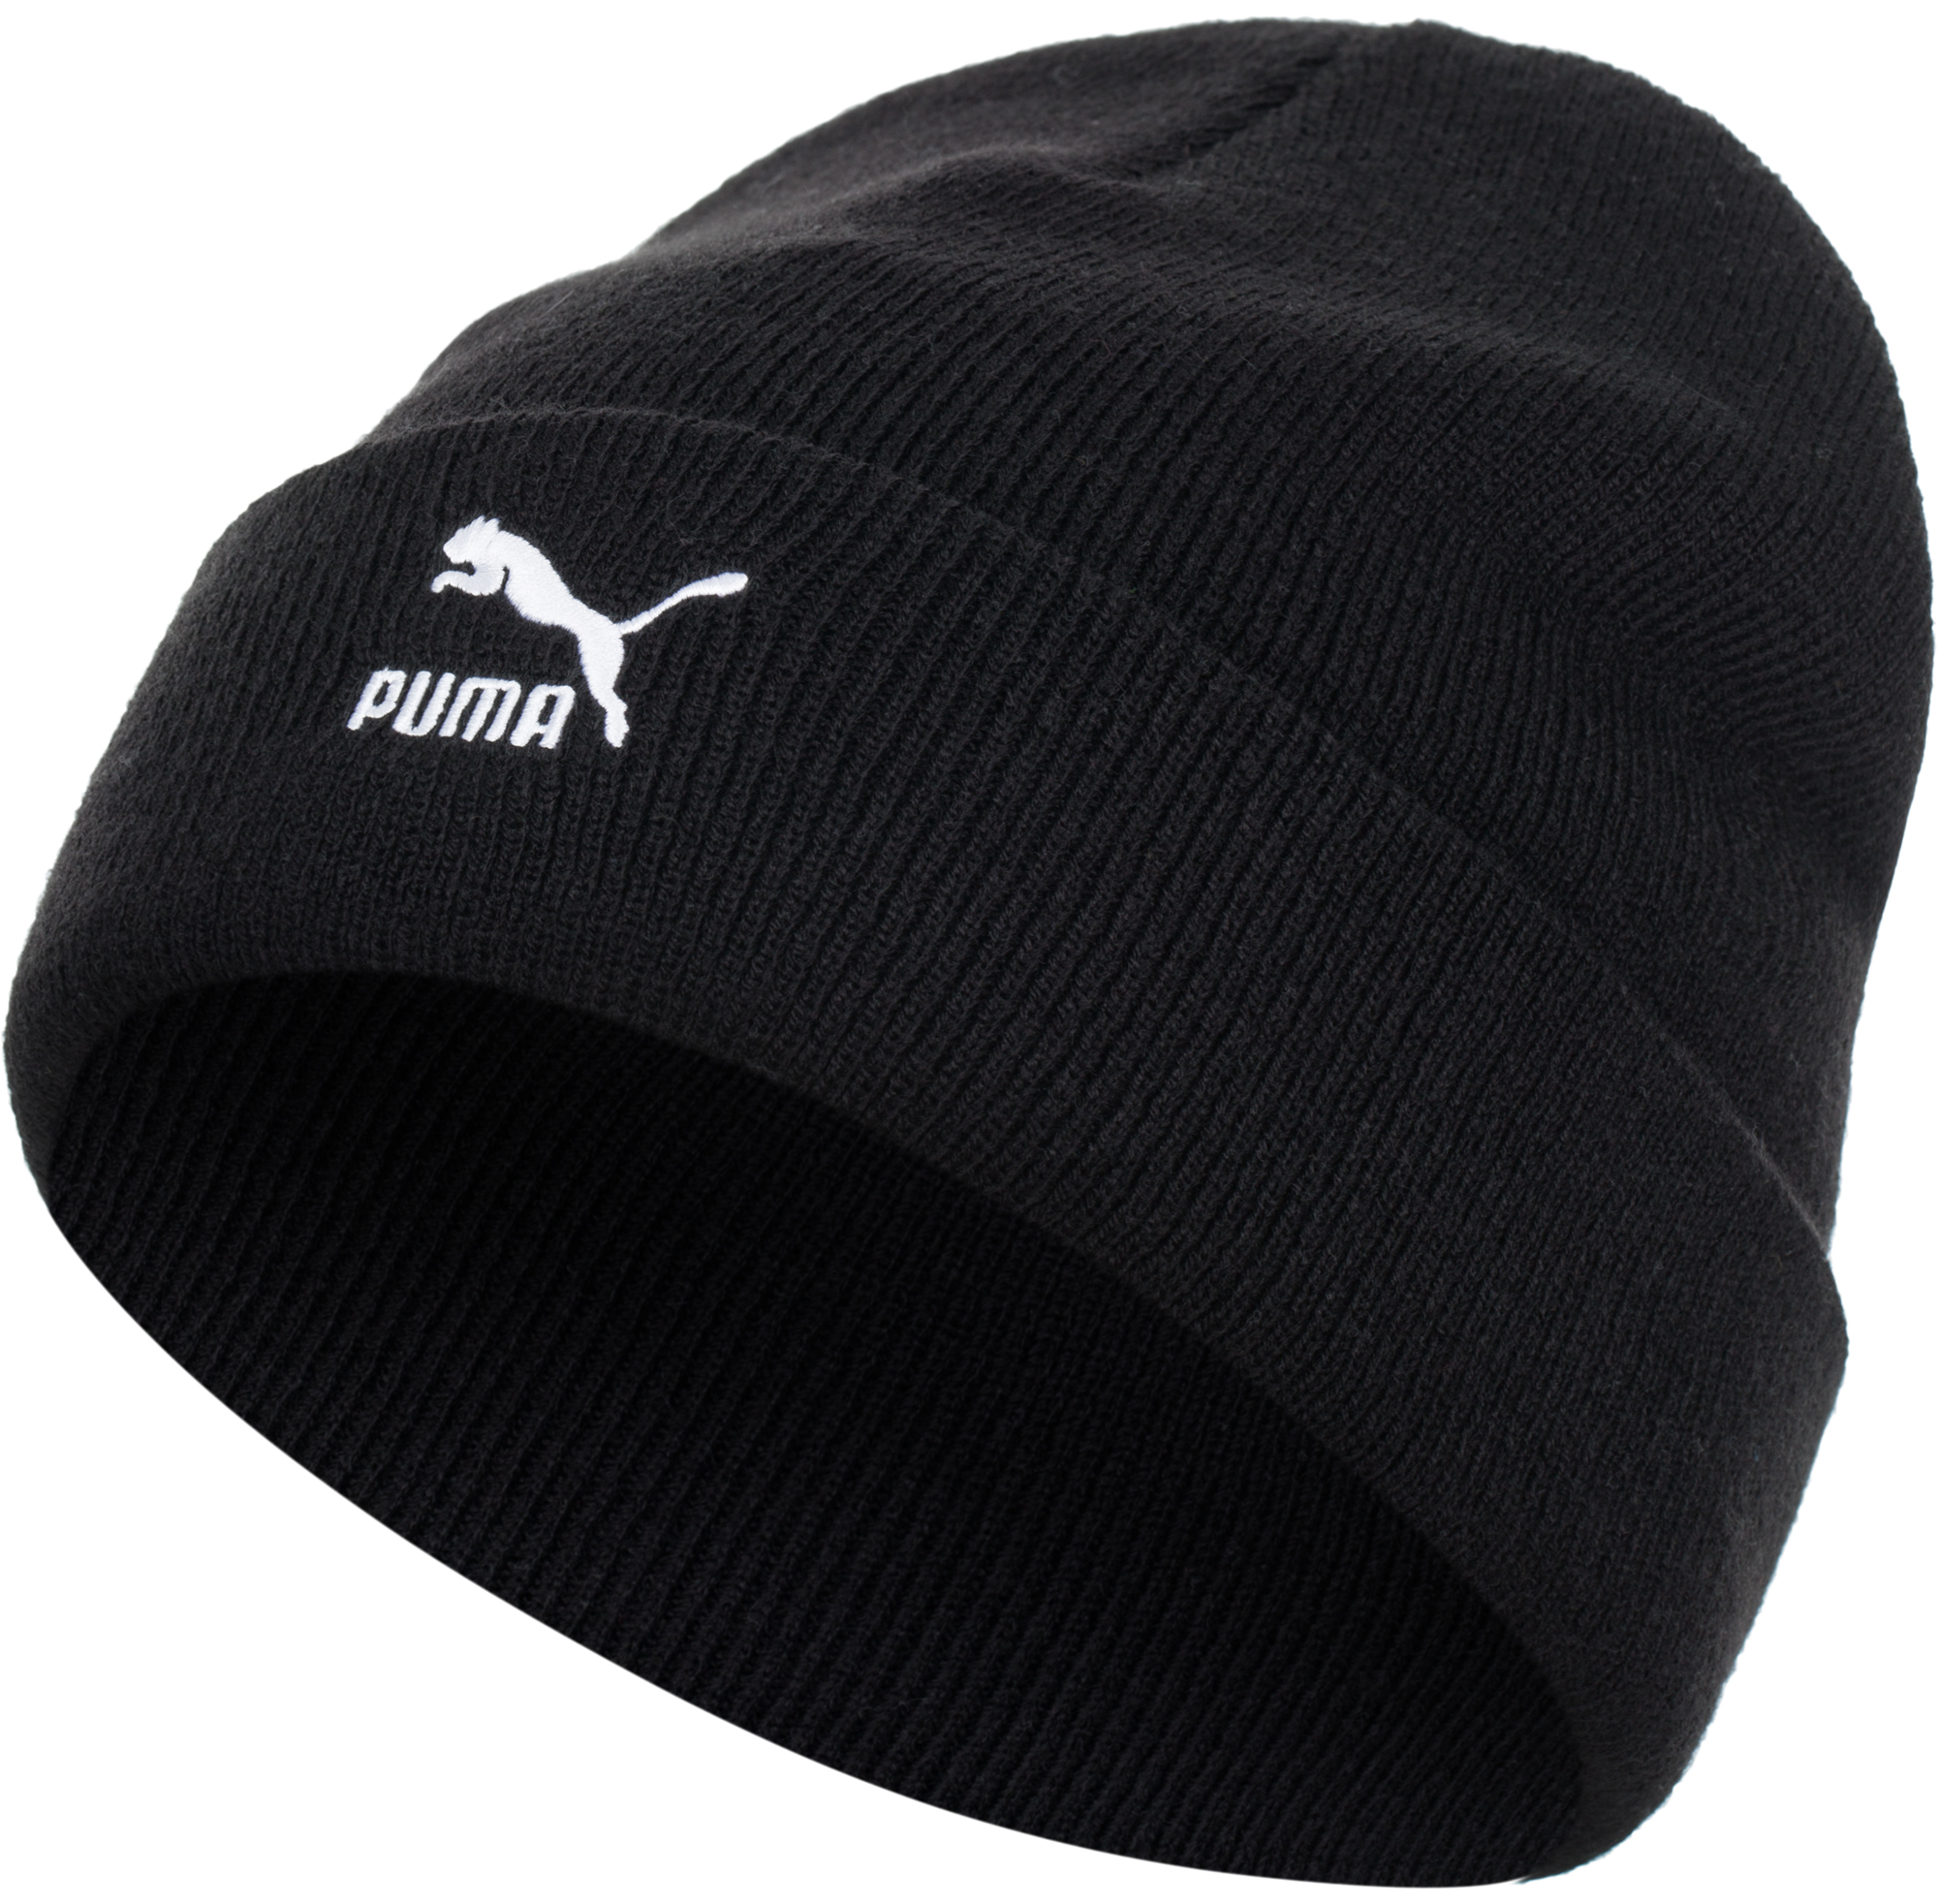 Puma Шапка Active